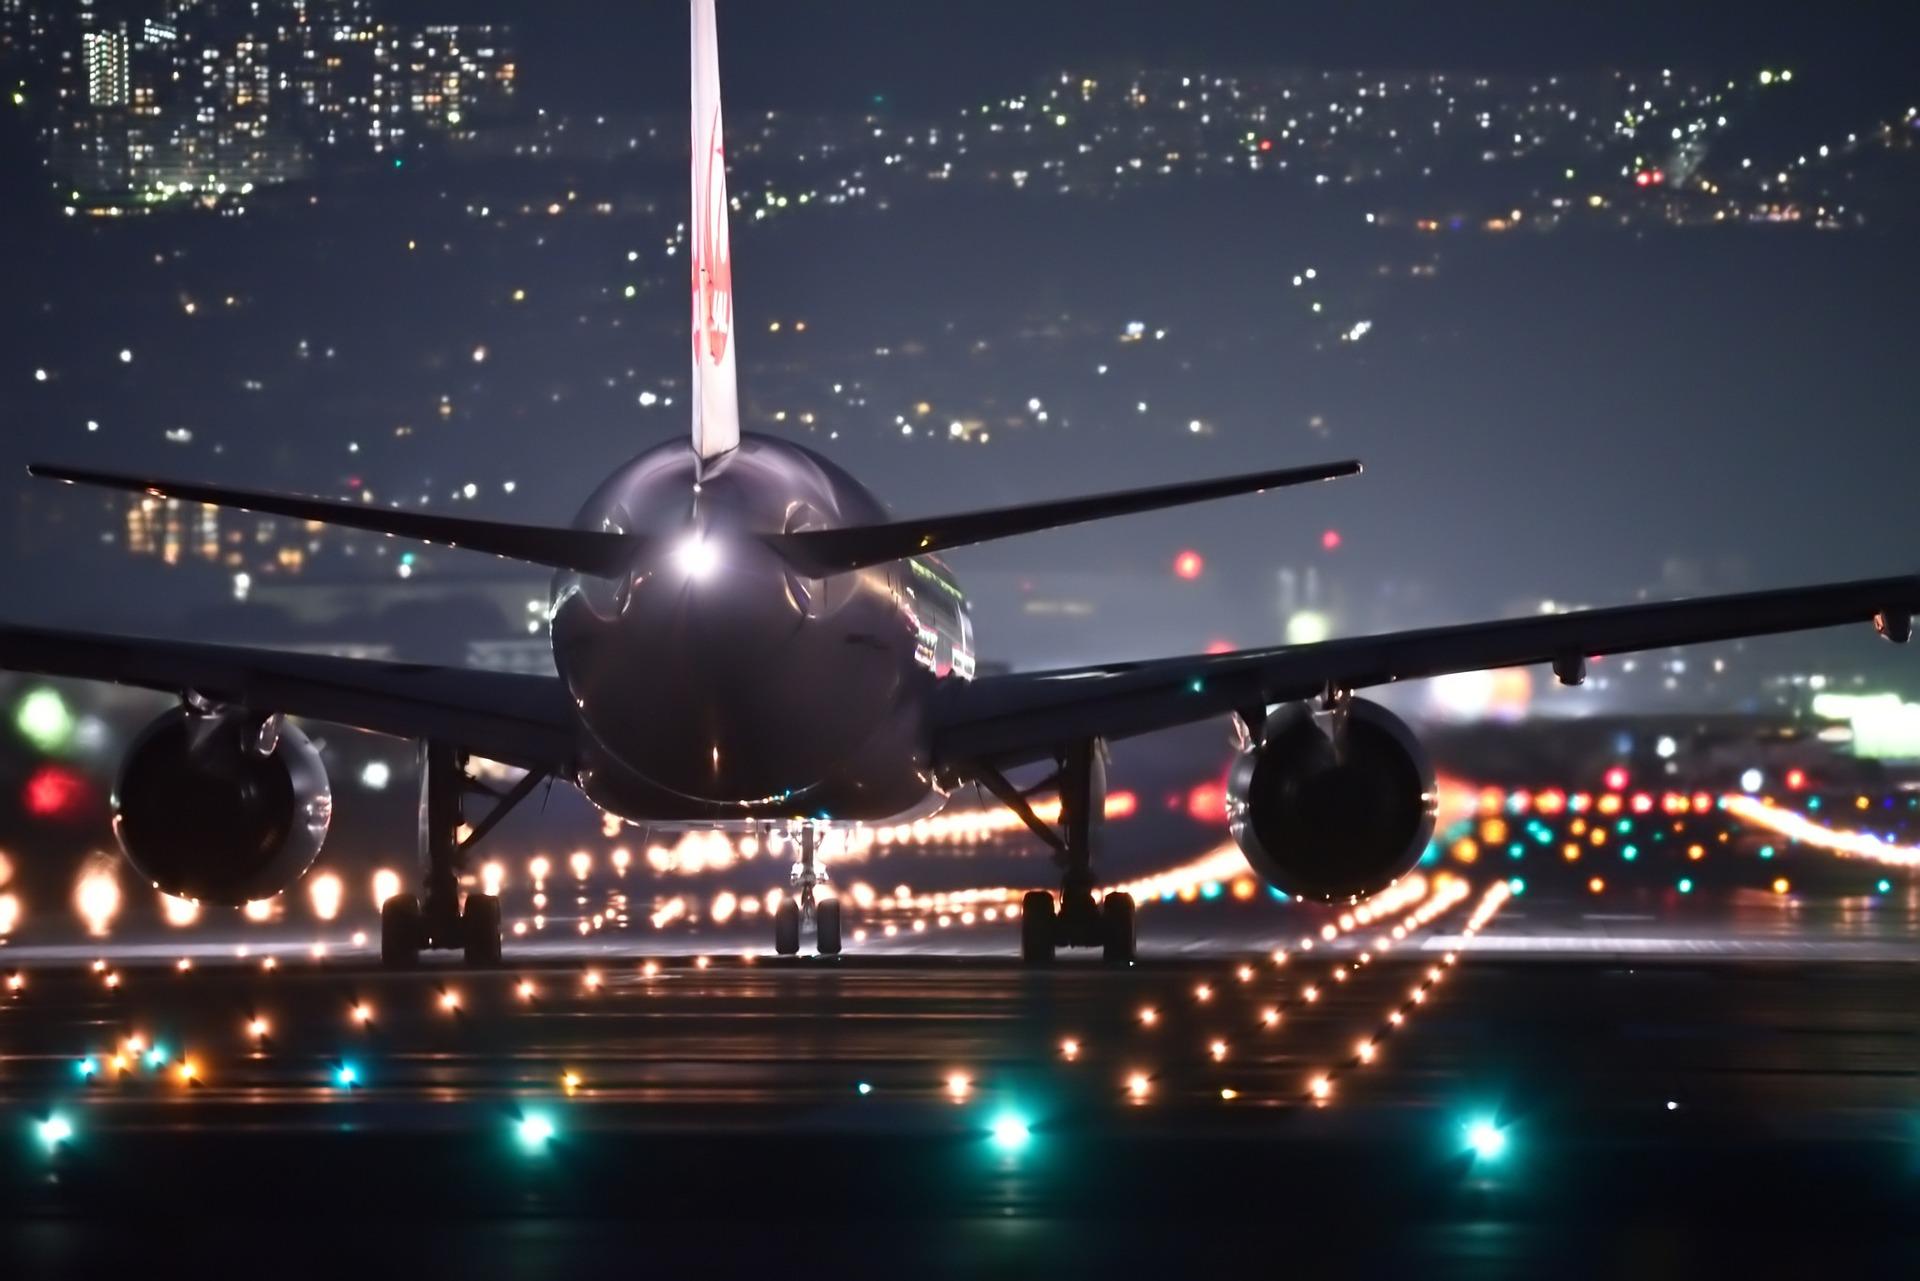 how to beat jet lag night travel plane